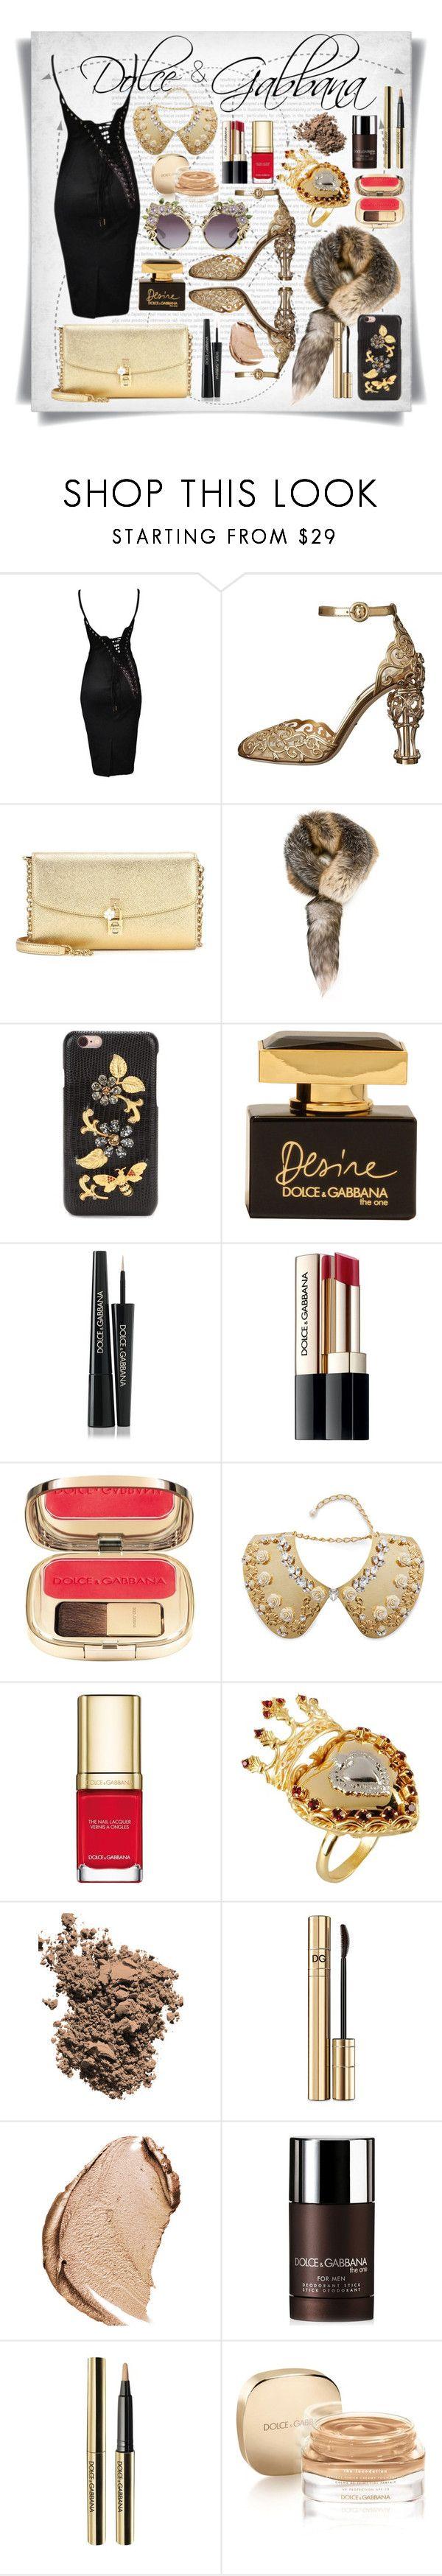 """Dolce&Gabbana Corset Black Dress"" by imbeauty ❤ liked on Polyvore featuring Oris, Dolce&Gabbana and dolcegabbana"